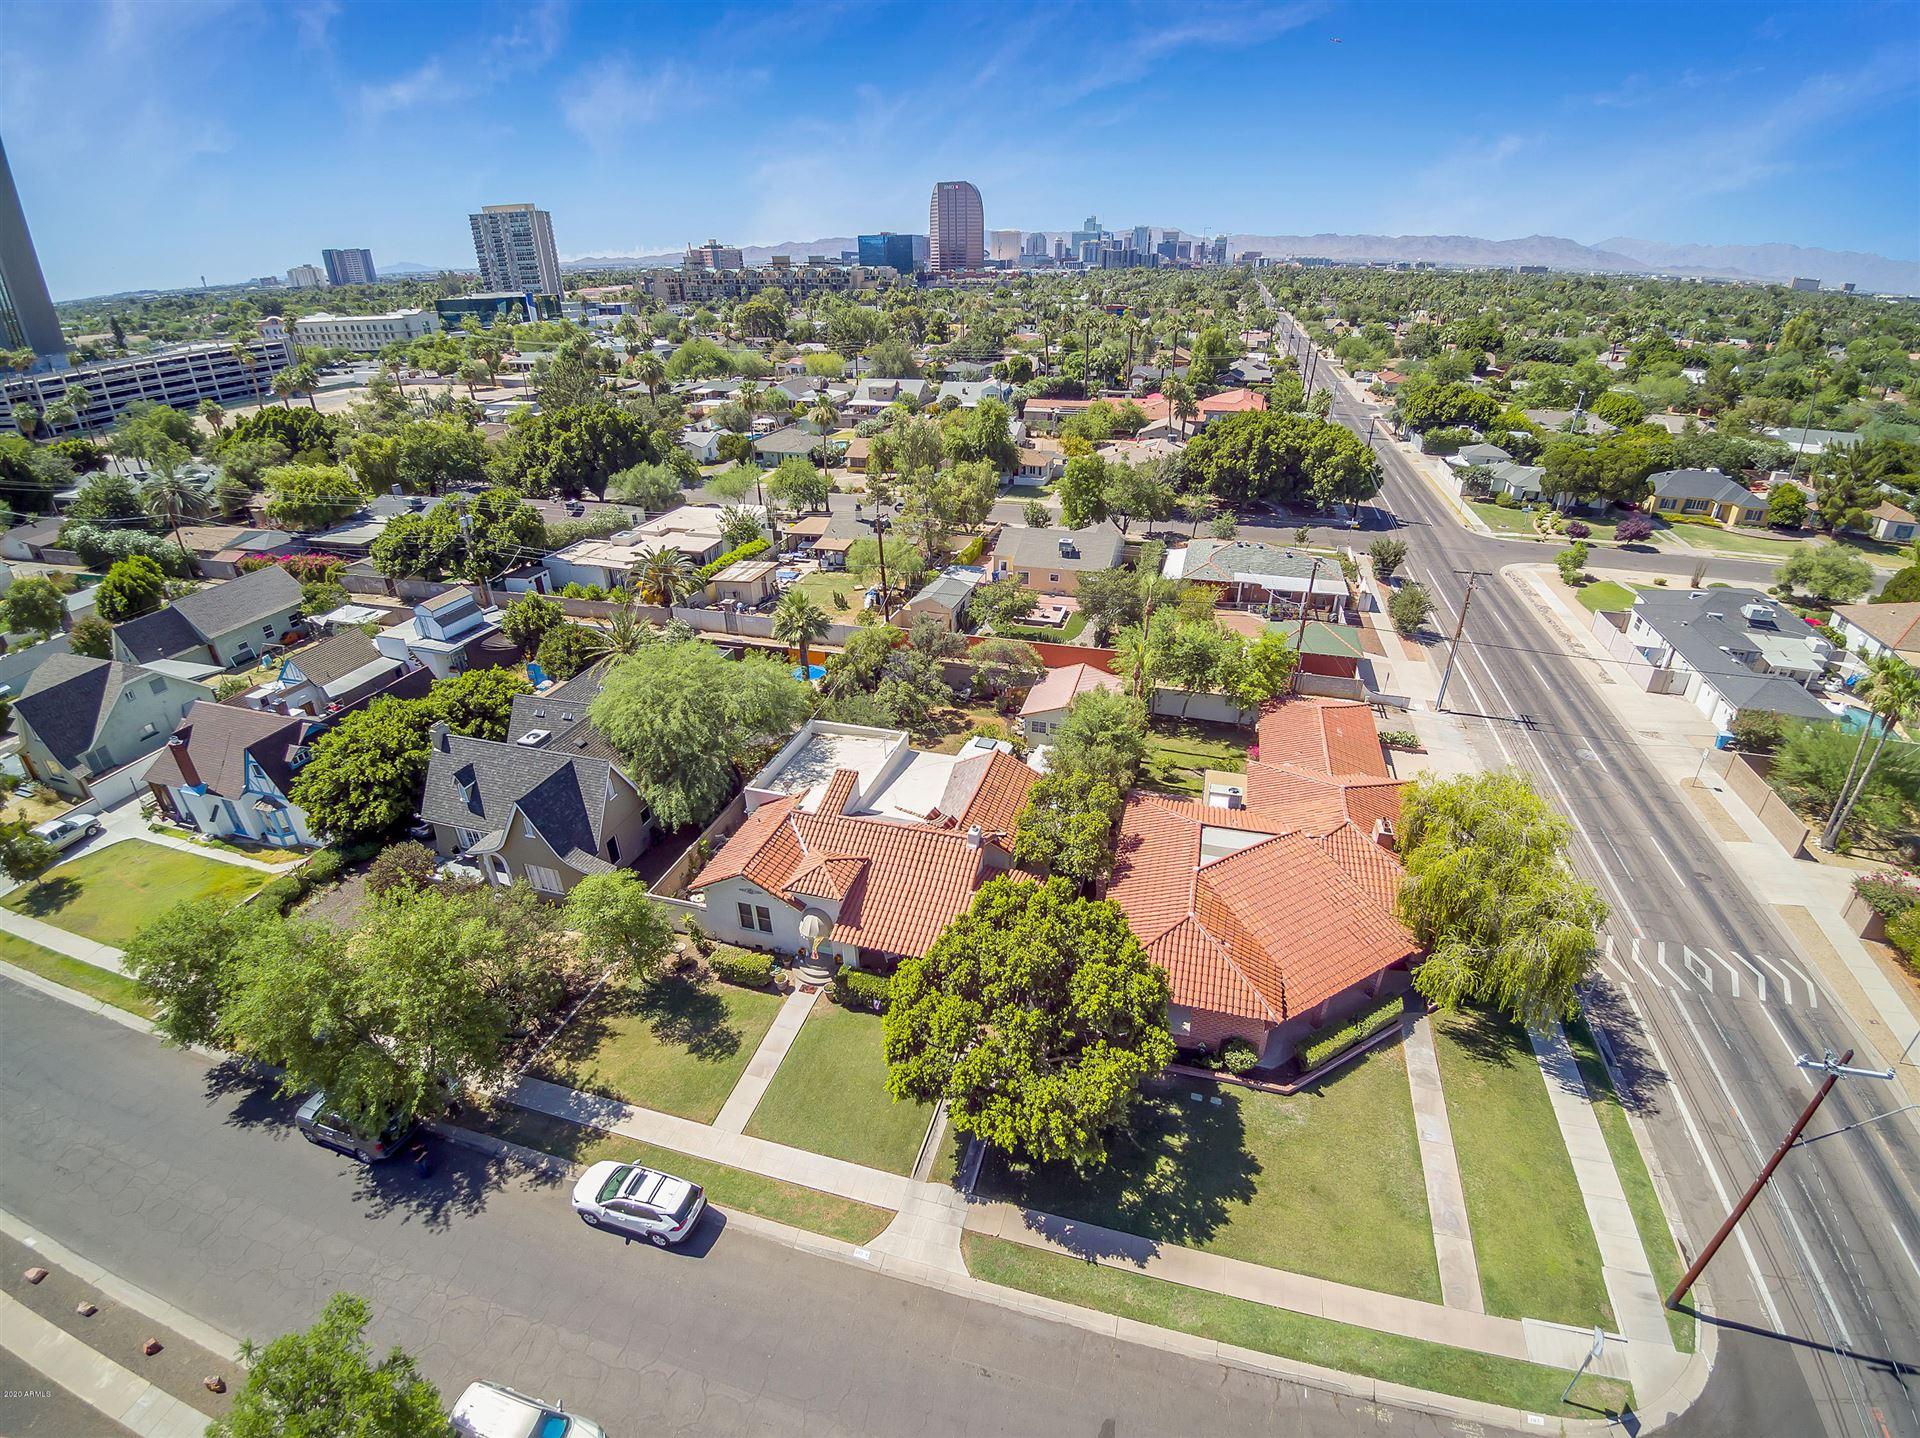 107 W WINDSOR Avenue, Phoenix, AZ 85003 - #: 6092561